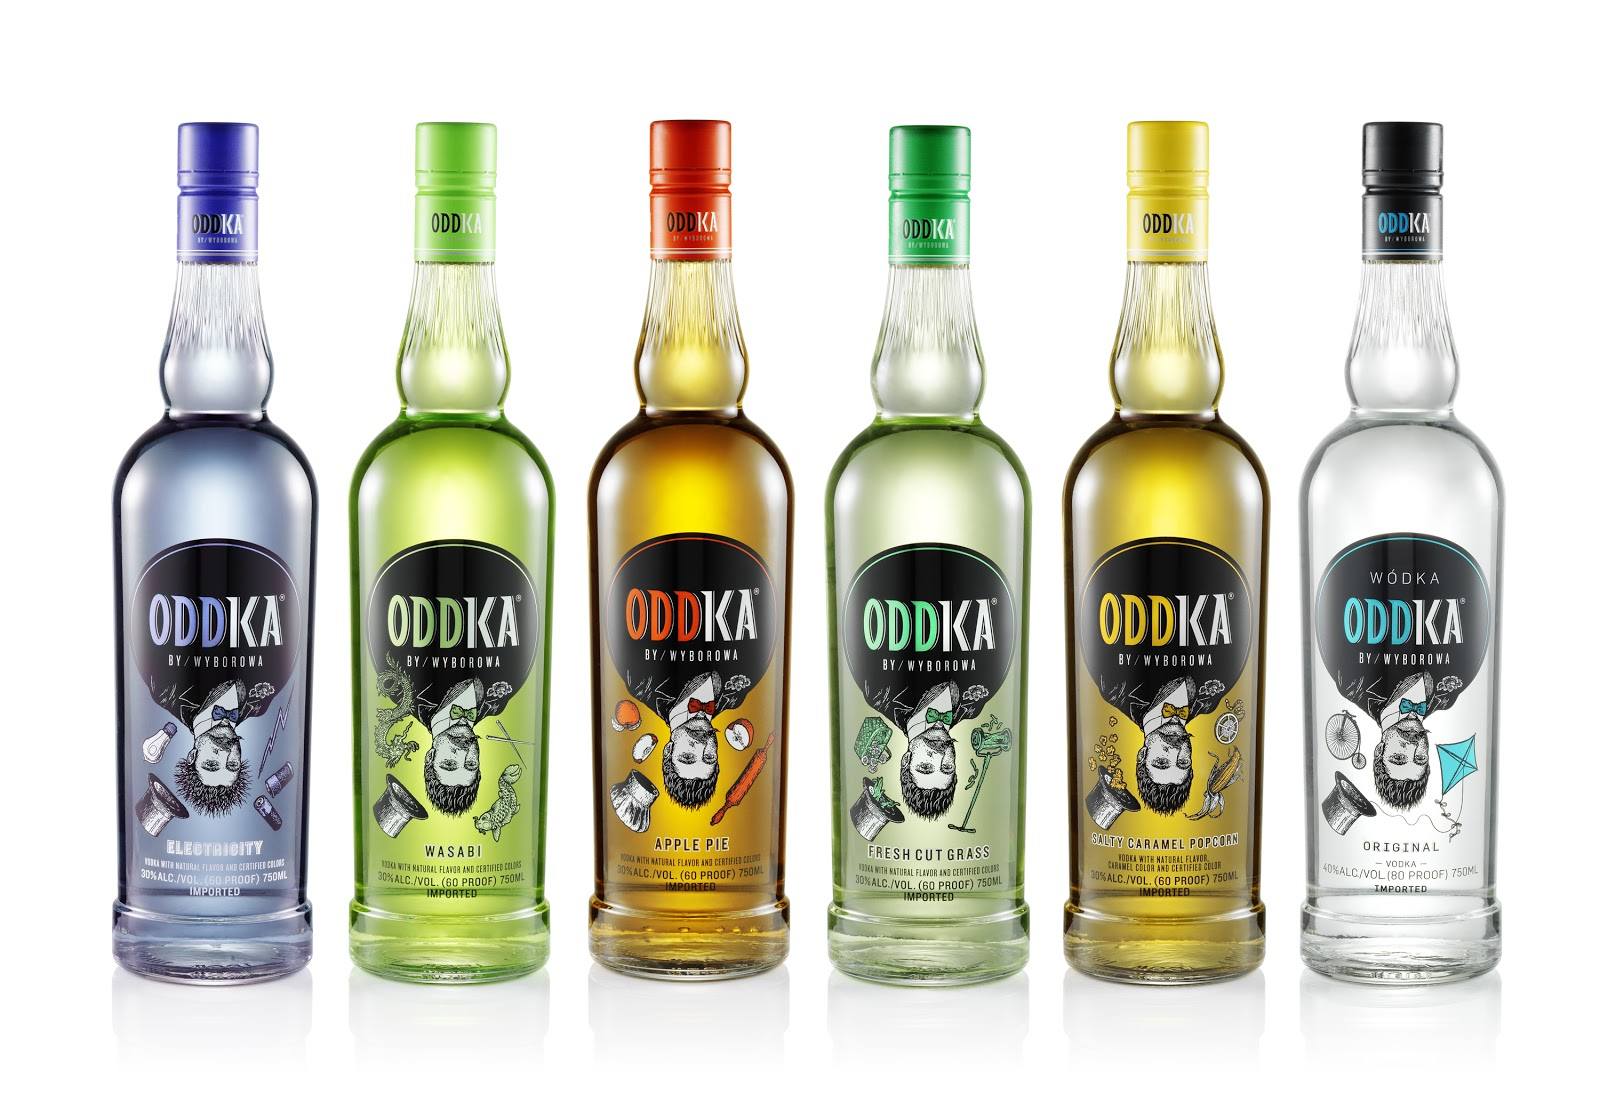 Oddka fresh cut grass wasabi apple pie salty caramel for Flavored vodka mixed drinks